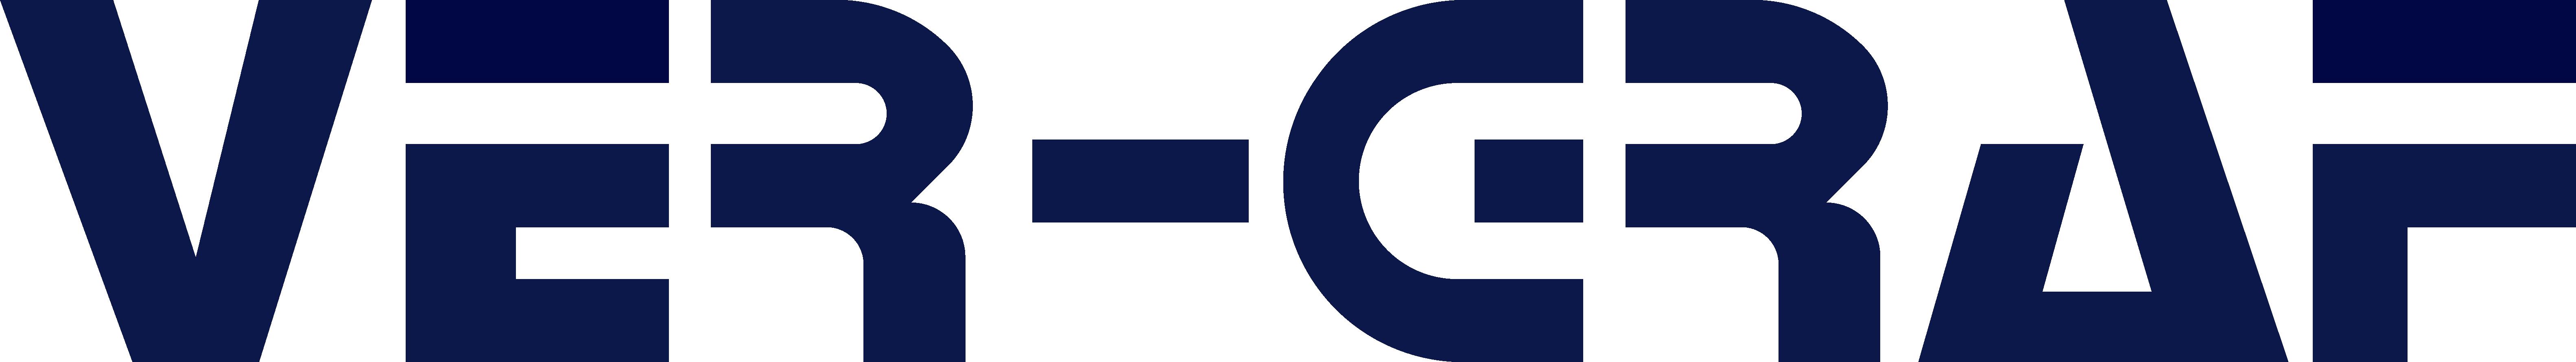 Utensileria Ver-Graf (VR)